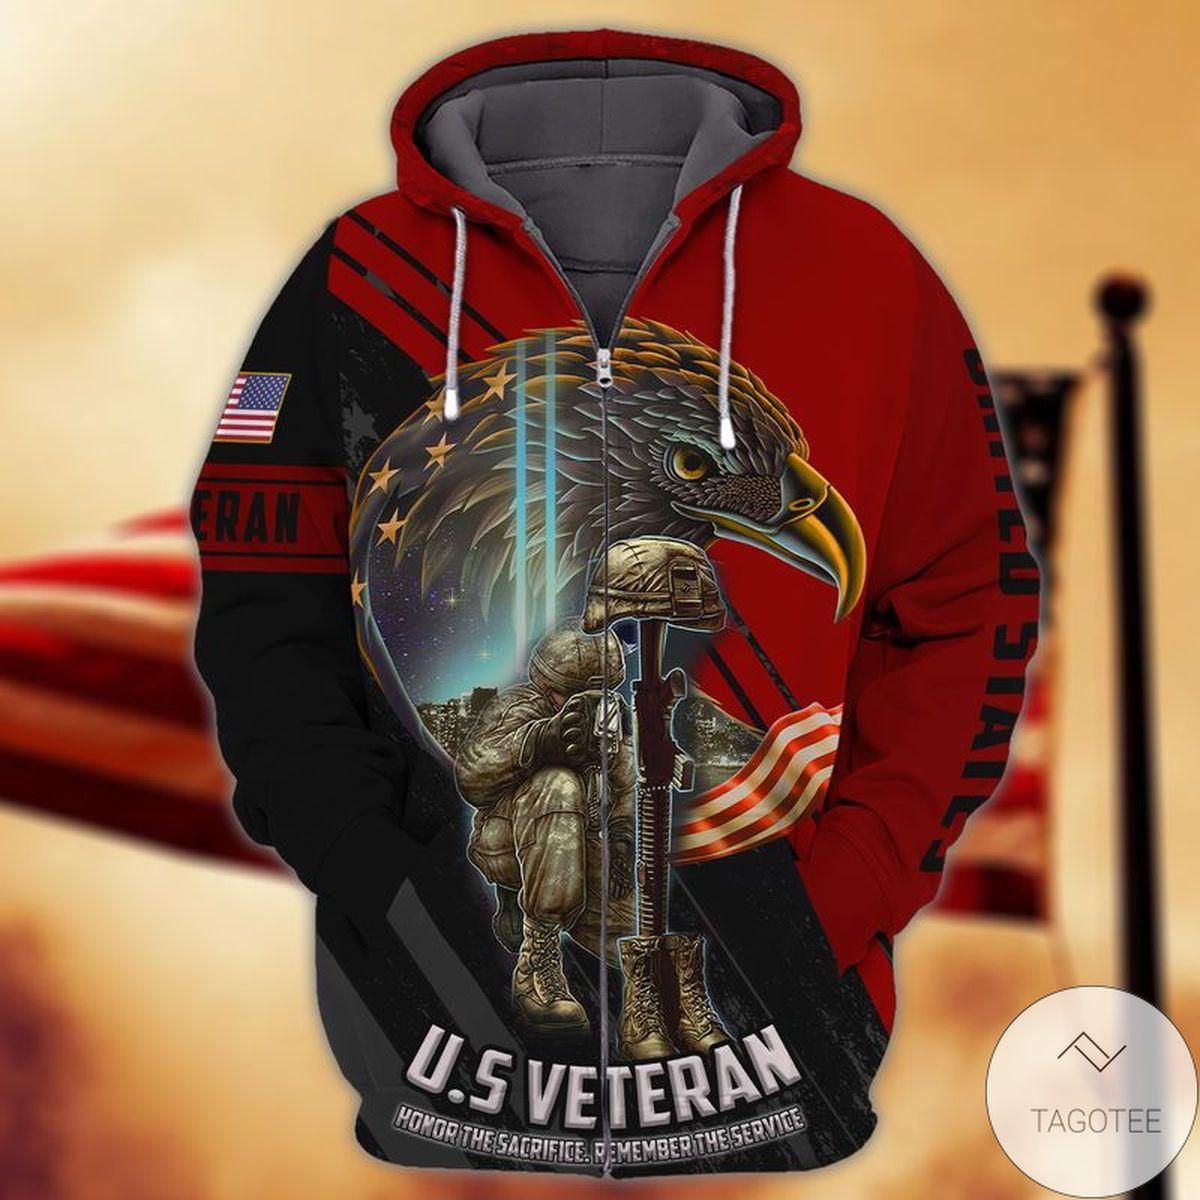 U.s Veteran Honor The Sacrifice Remember The Serve 3d Zip Hoodie